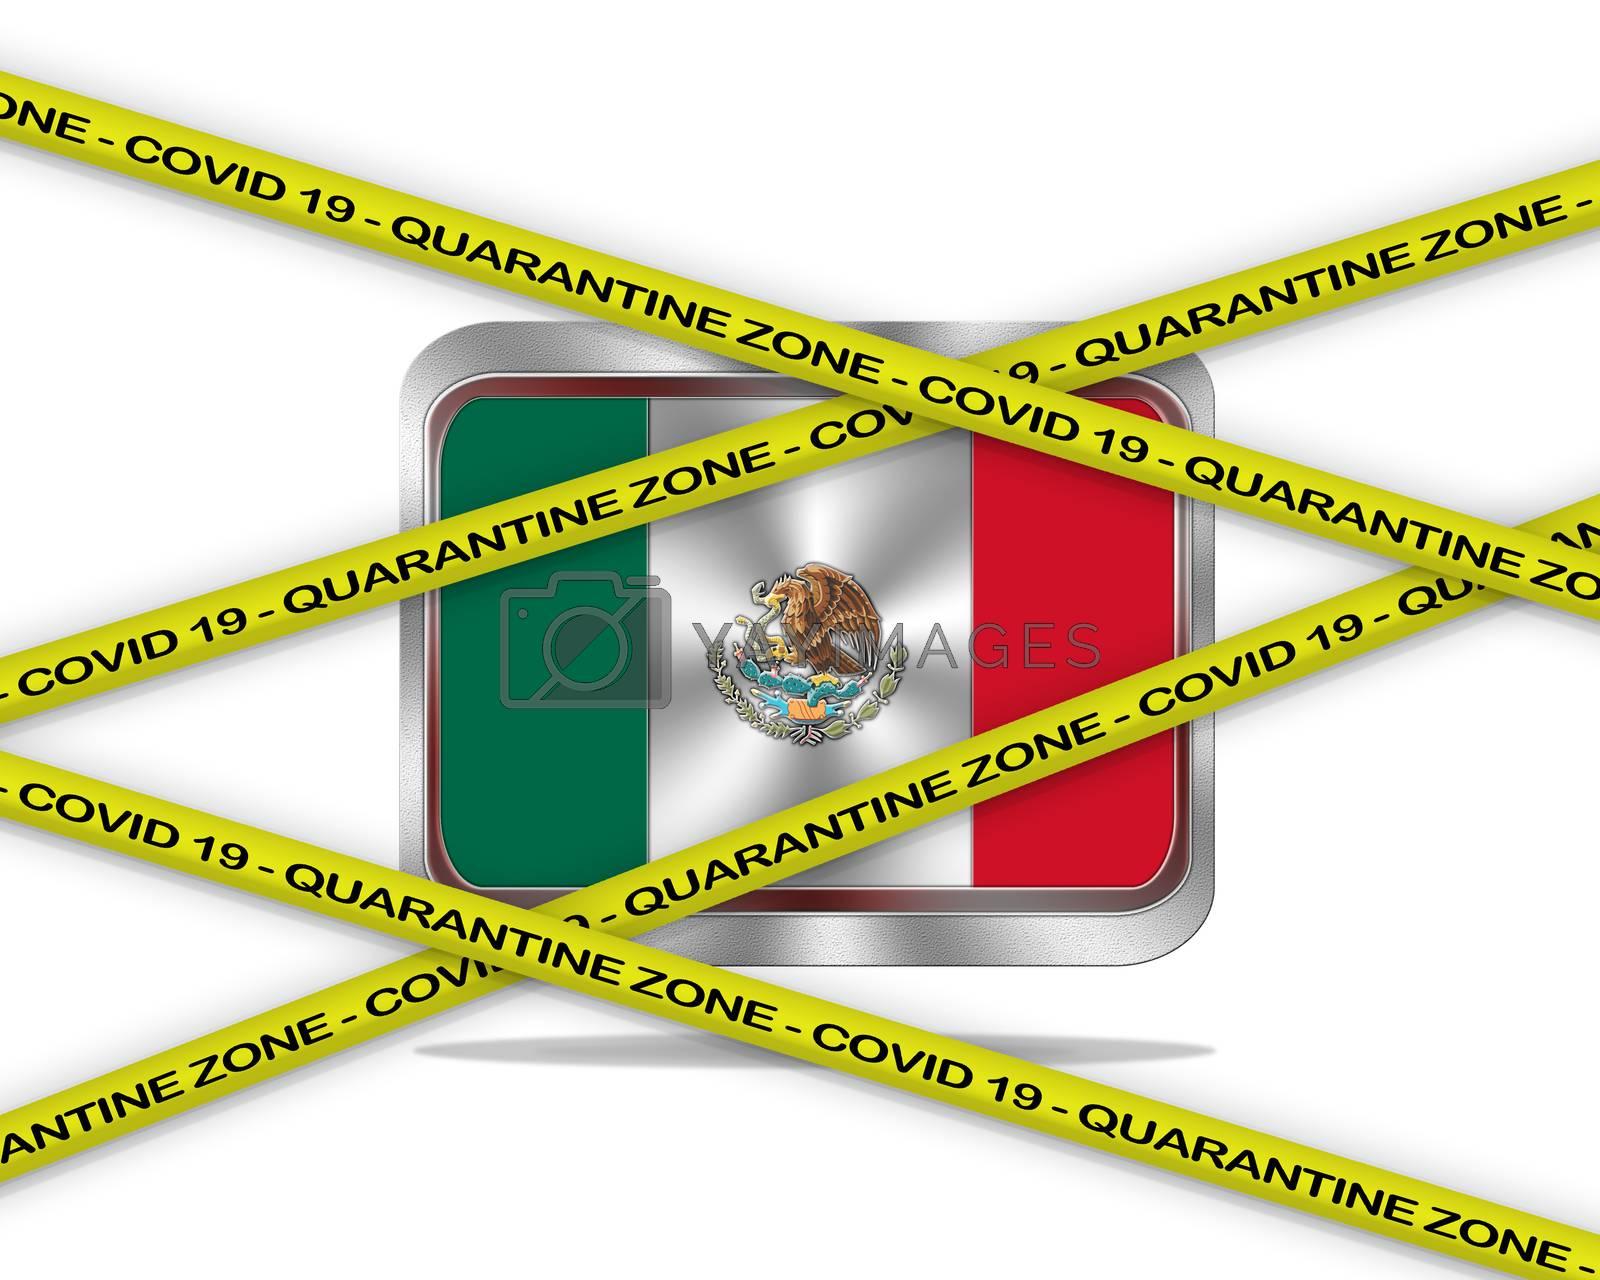 COVID-19 warning yellow ribbon written with: Quarantine zone Cover 19 on Mexico flag illustration. Coronavirus danger area, quarantined country.